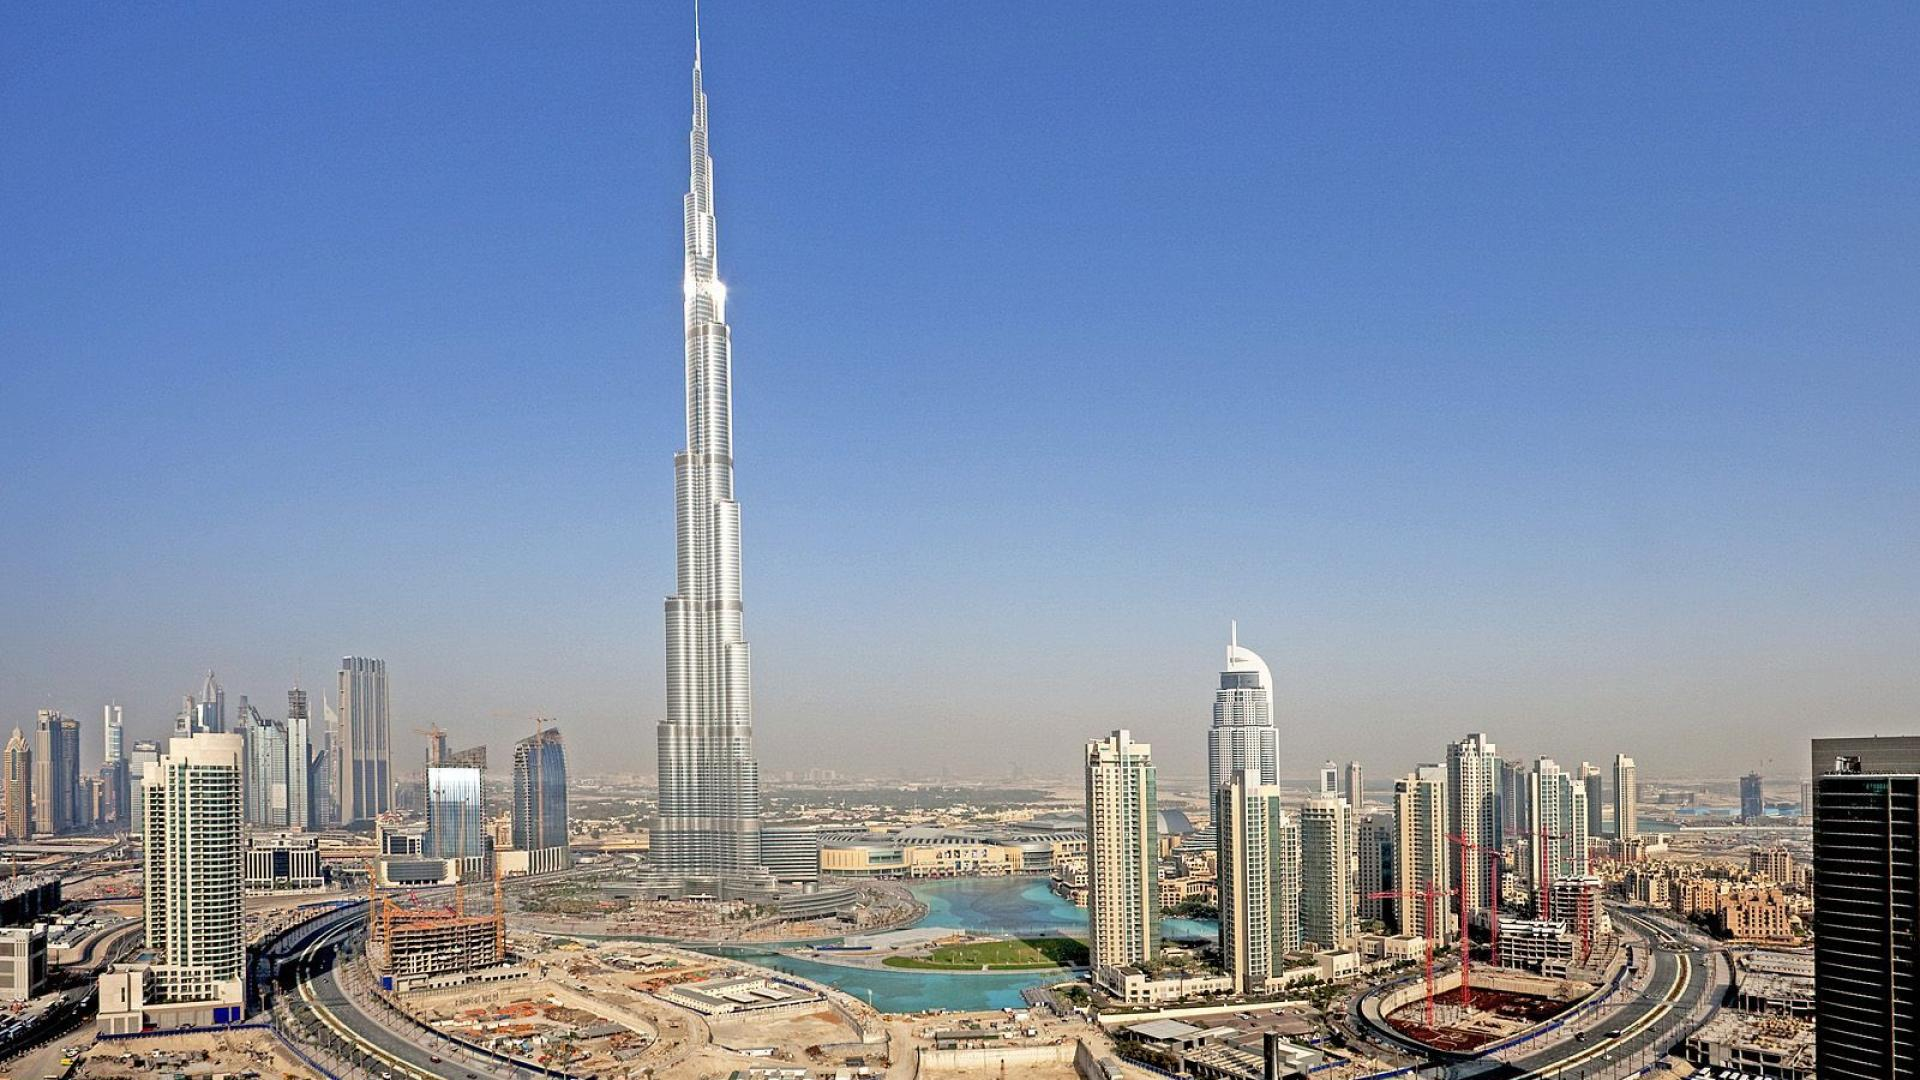 Dubai wallpaper hd wallpapersafari - Dubai burj khalifa hd photos ...